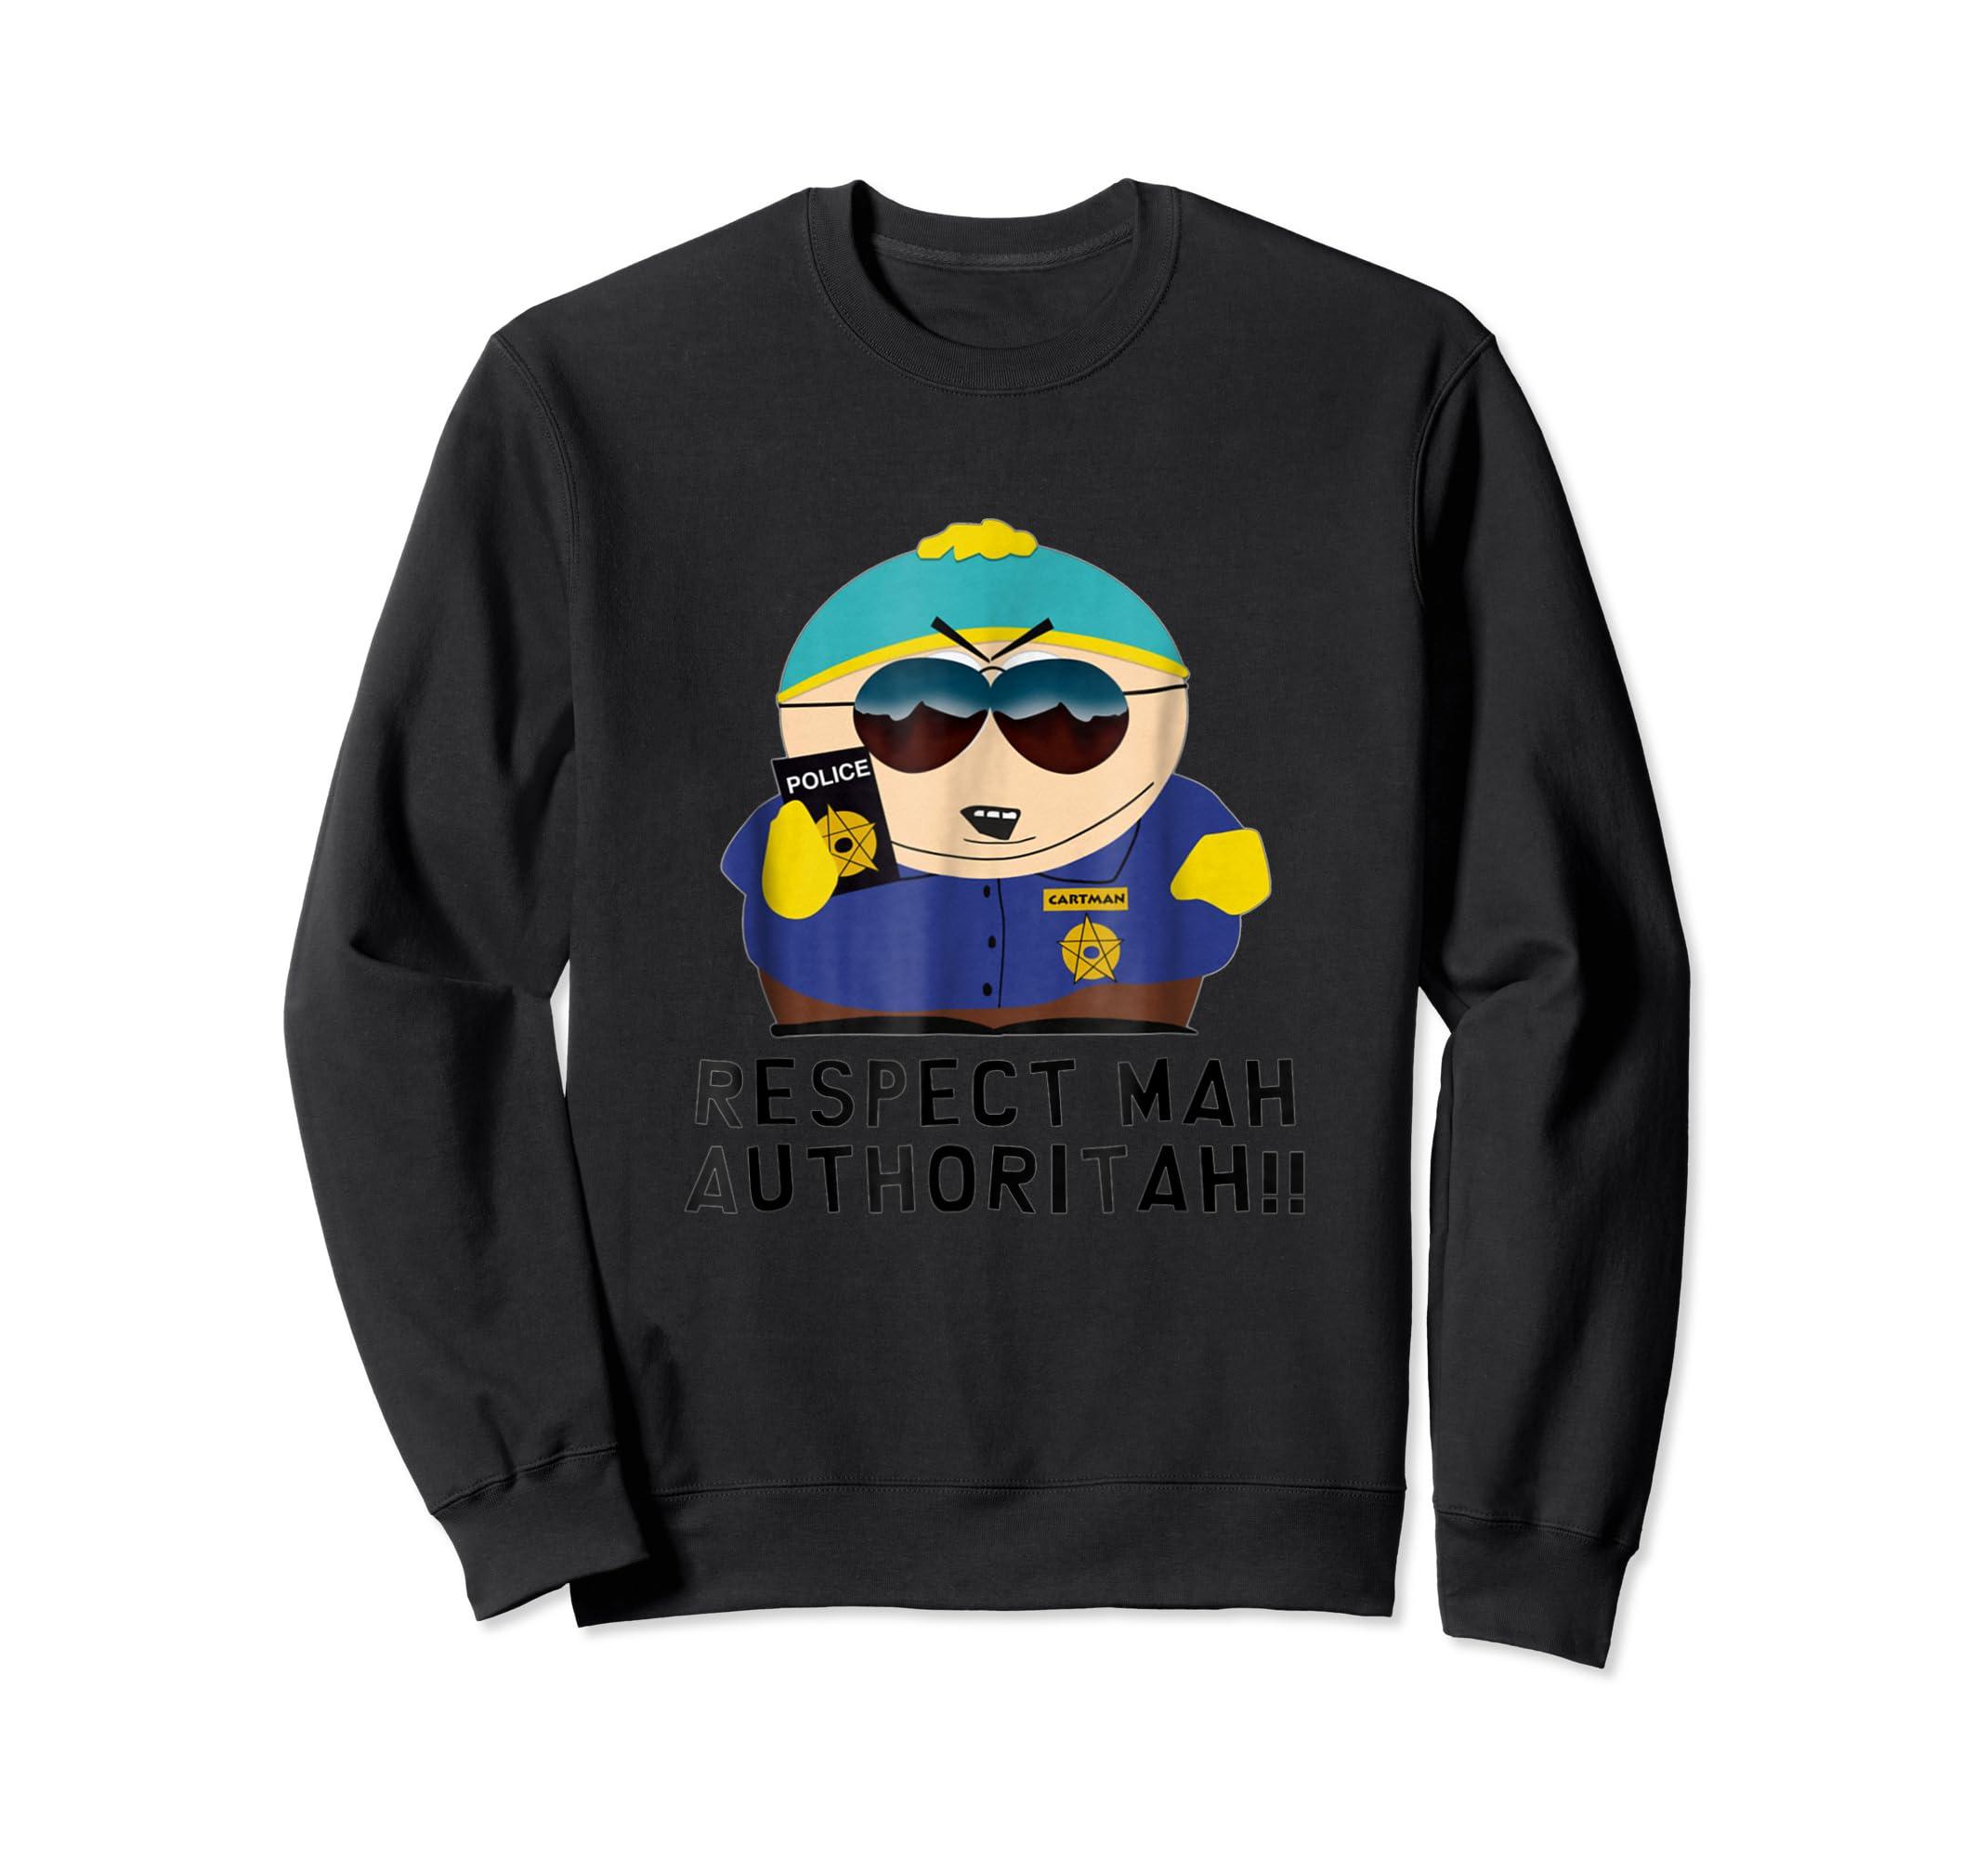 Cartman RESPECT MAH AUTHORITAH shirt-Sweatshirt-Black